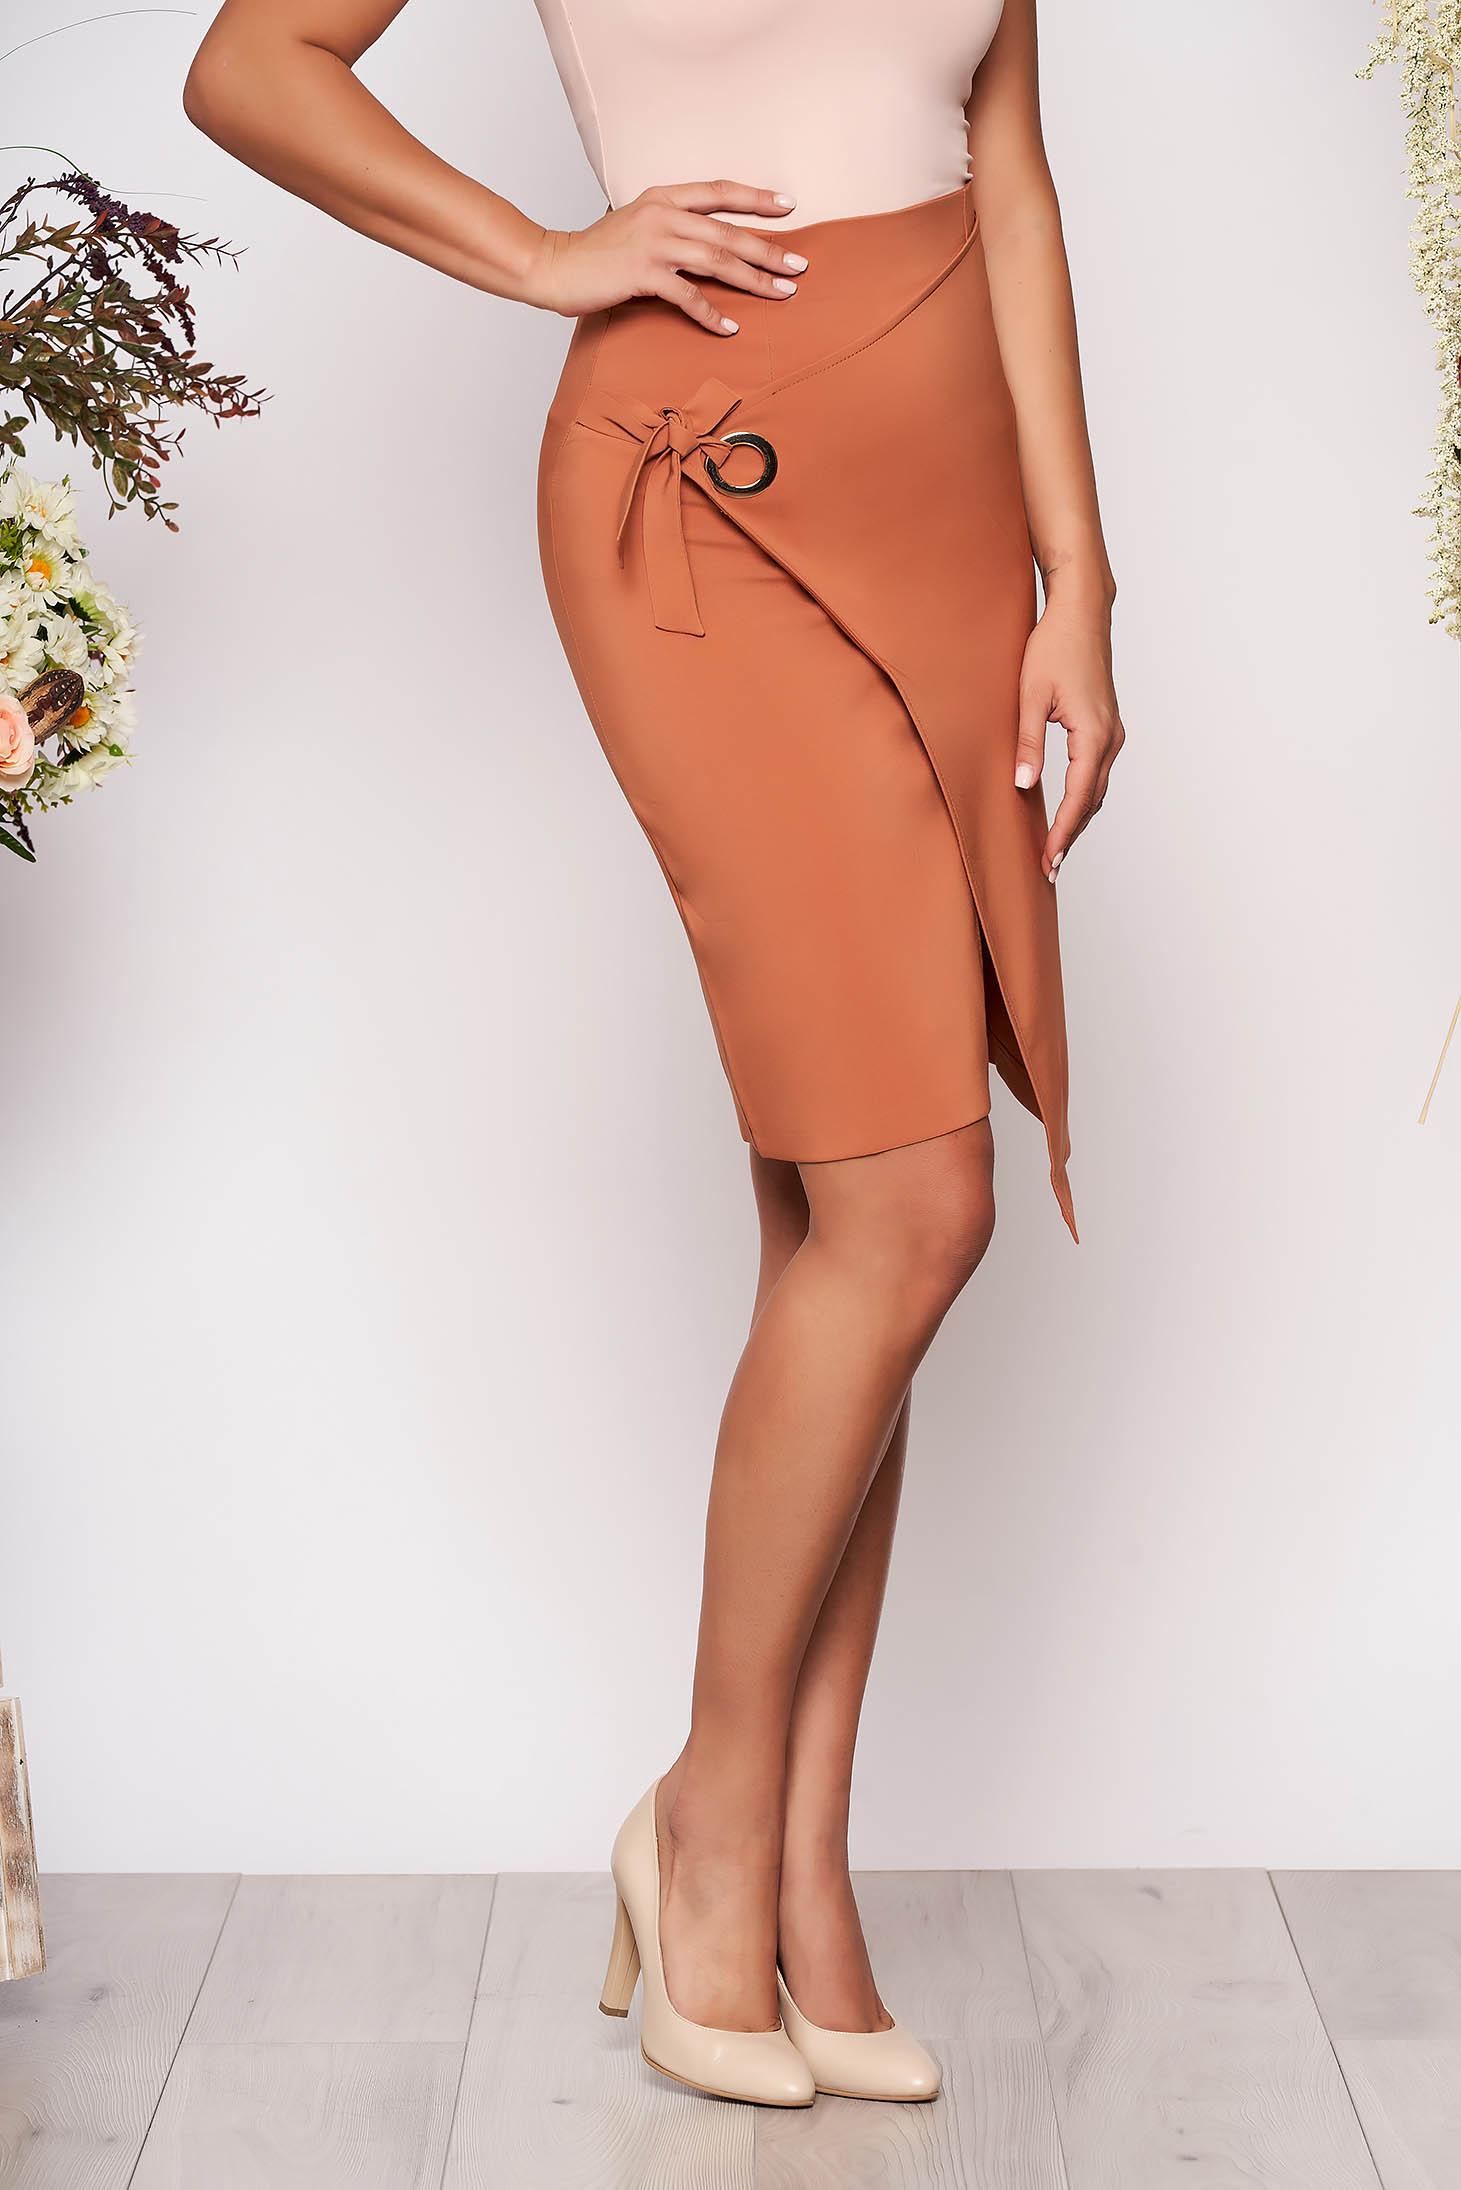 Brown skirt office midi pencil slightly elastic fabric high waisted